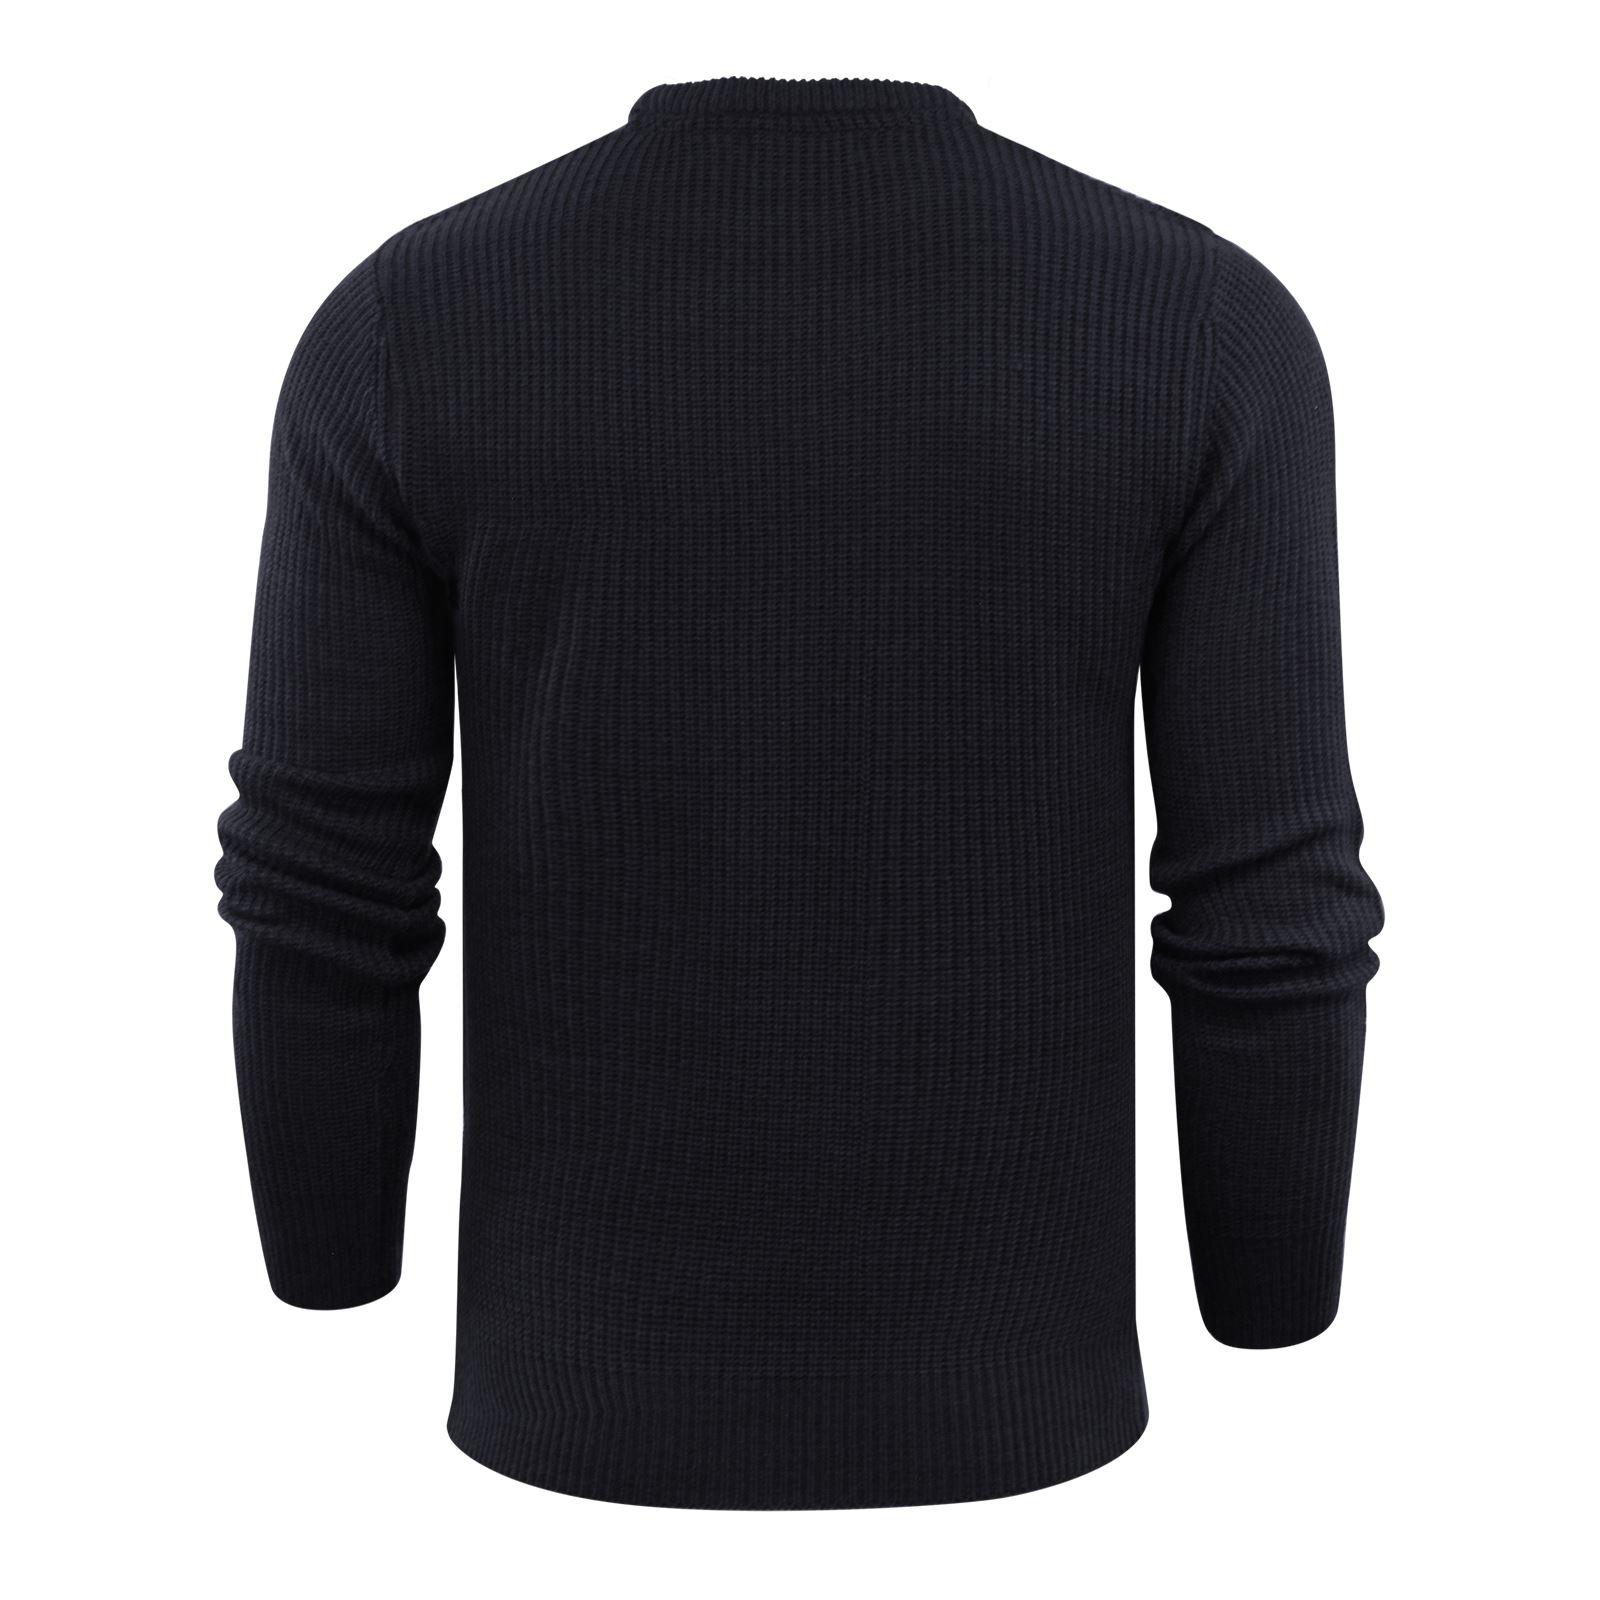 Brave-Soul-Fulton-Mens-Jumper-Kintted-Crew-Neck-Sweater thumbnail 5